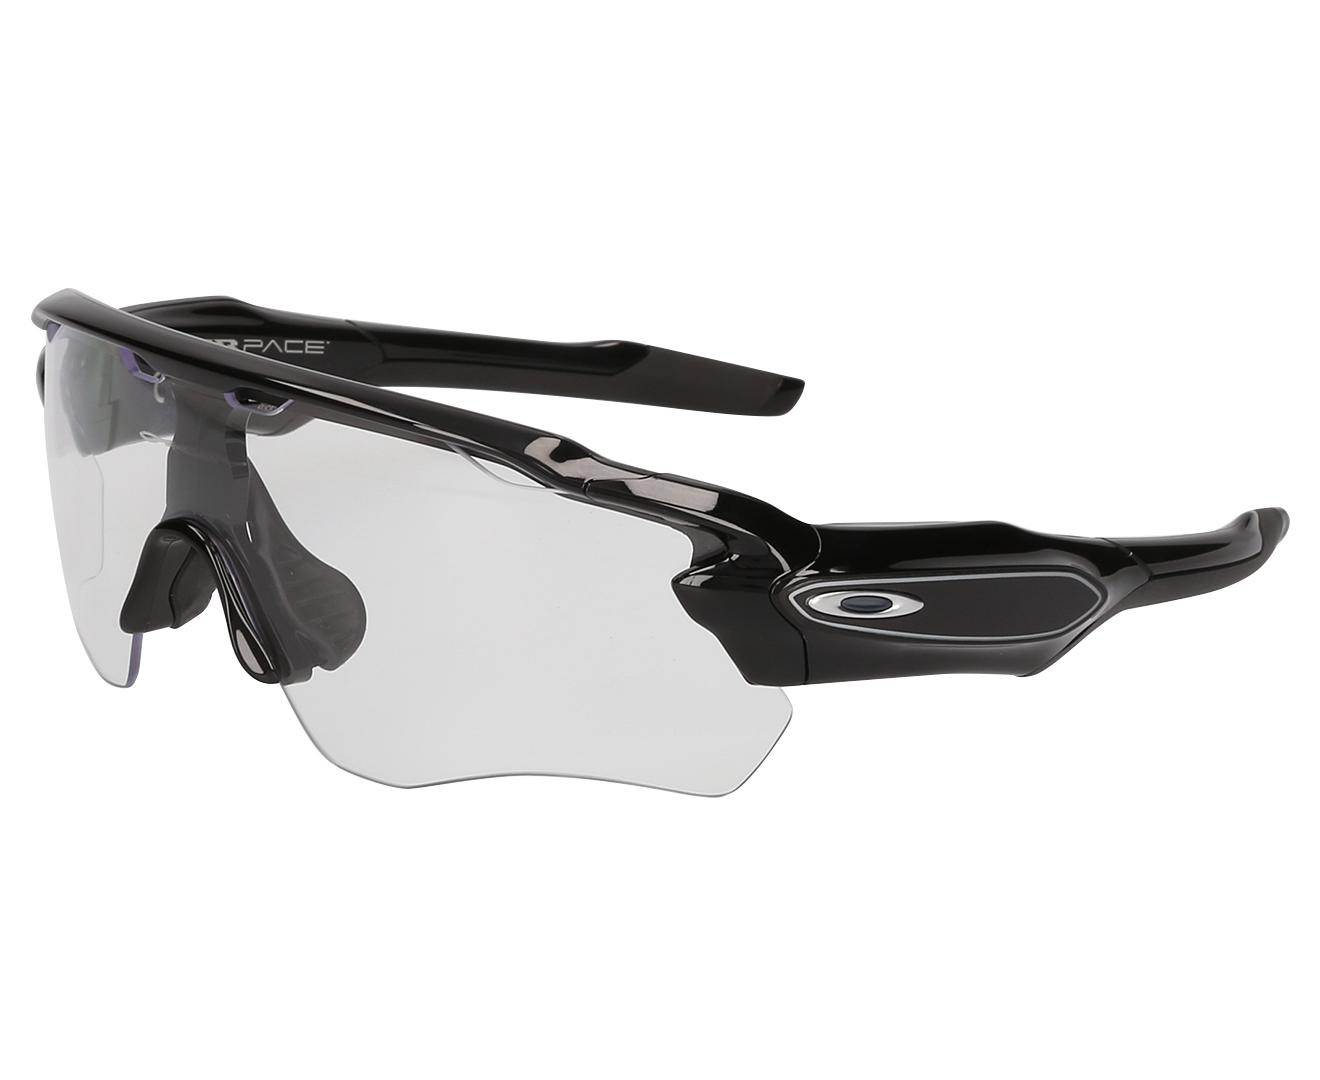 97944eb0742e Oakley Men s Radar Pace Sunglasses - Polished Black Prizm Road ...